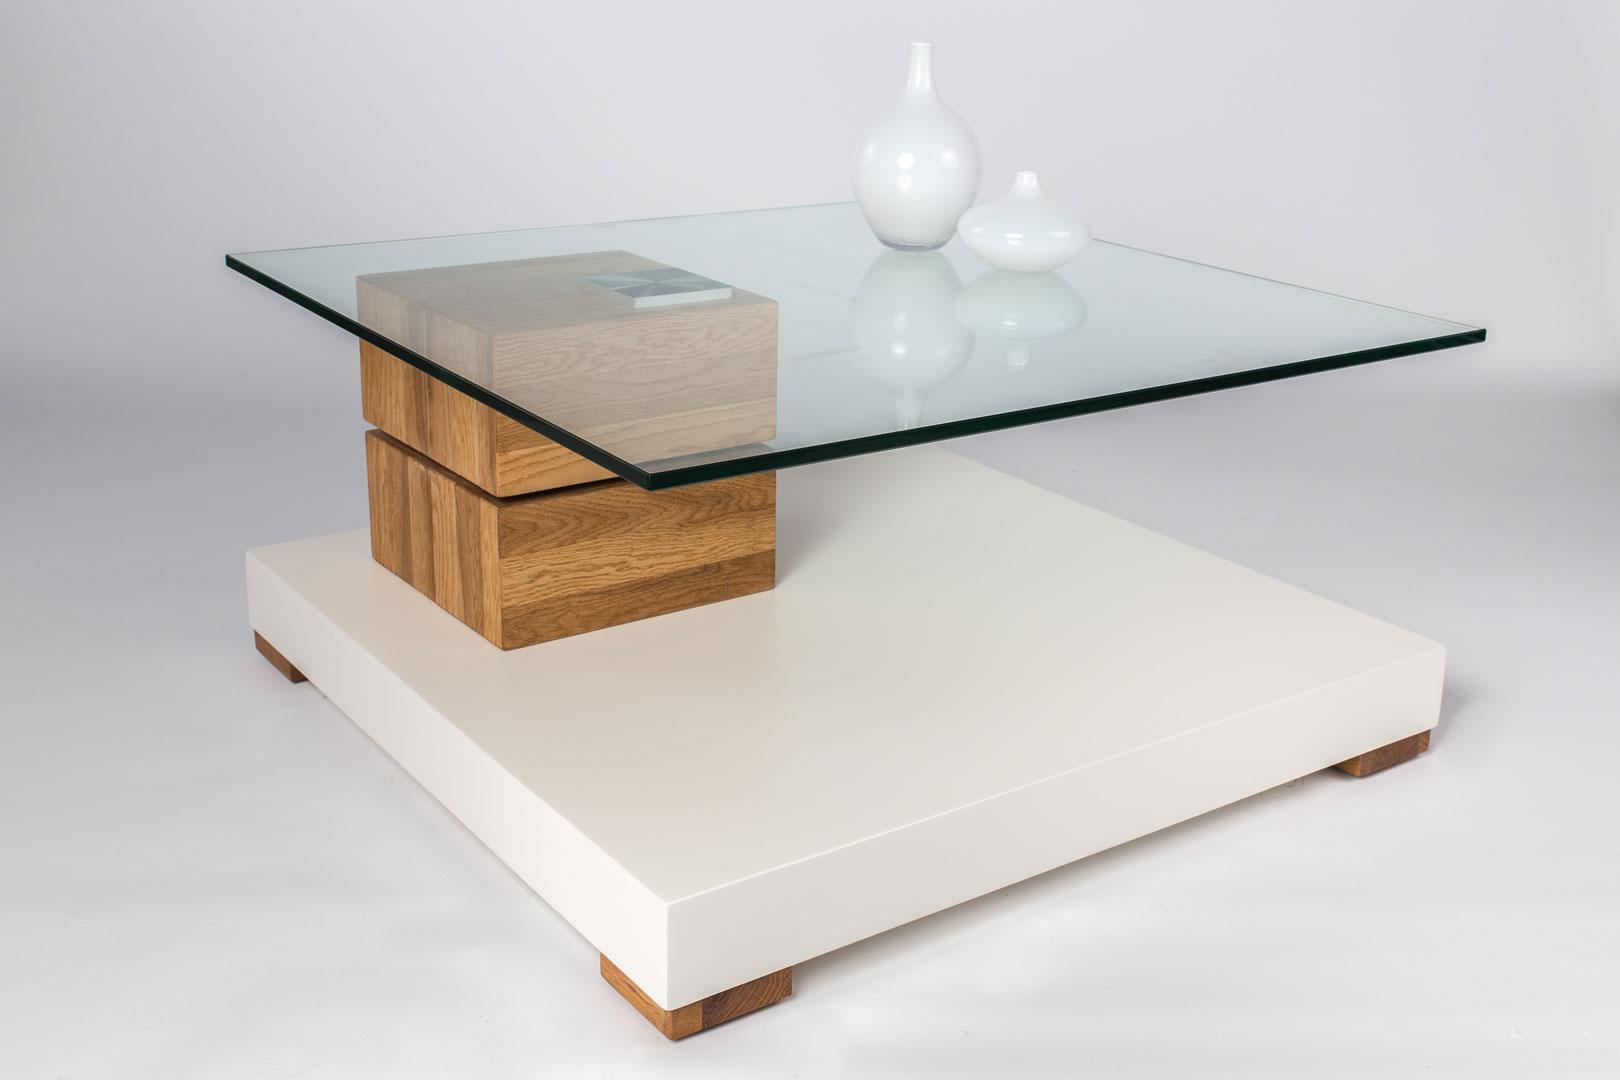 Table Basse Design Pivotante Coloris Chêneblanc Mat Marocco